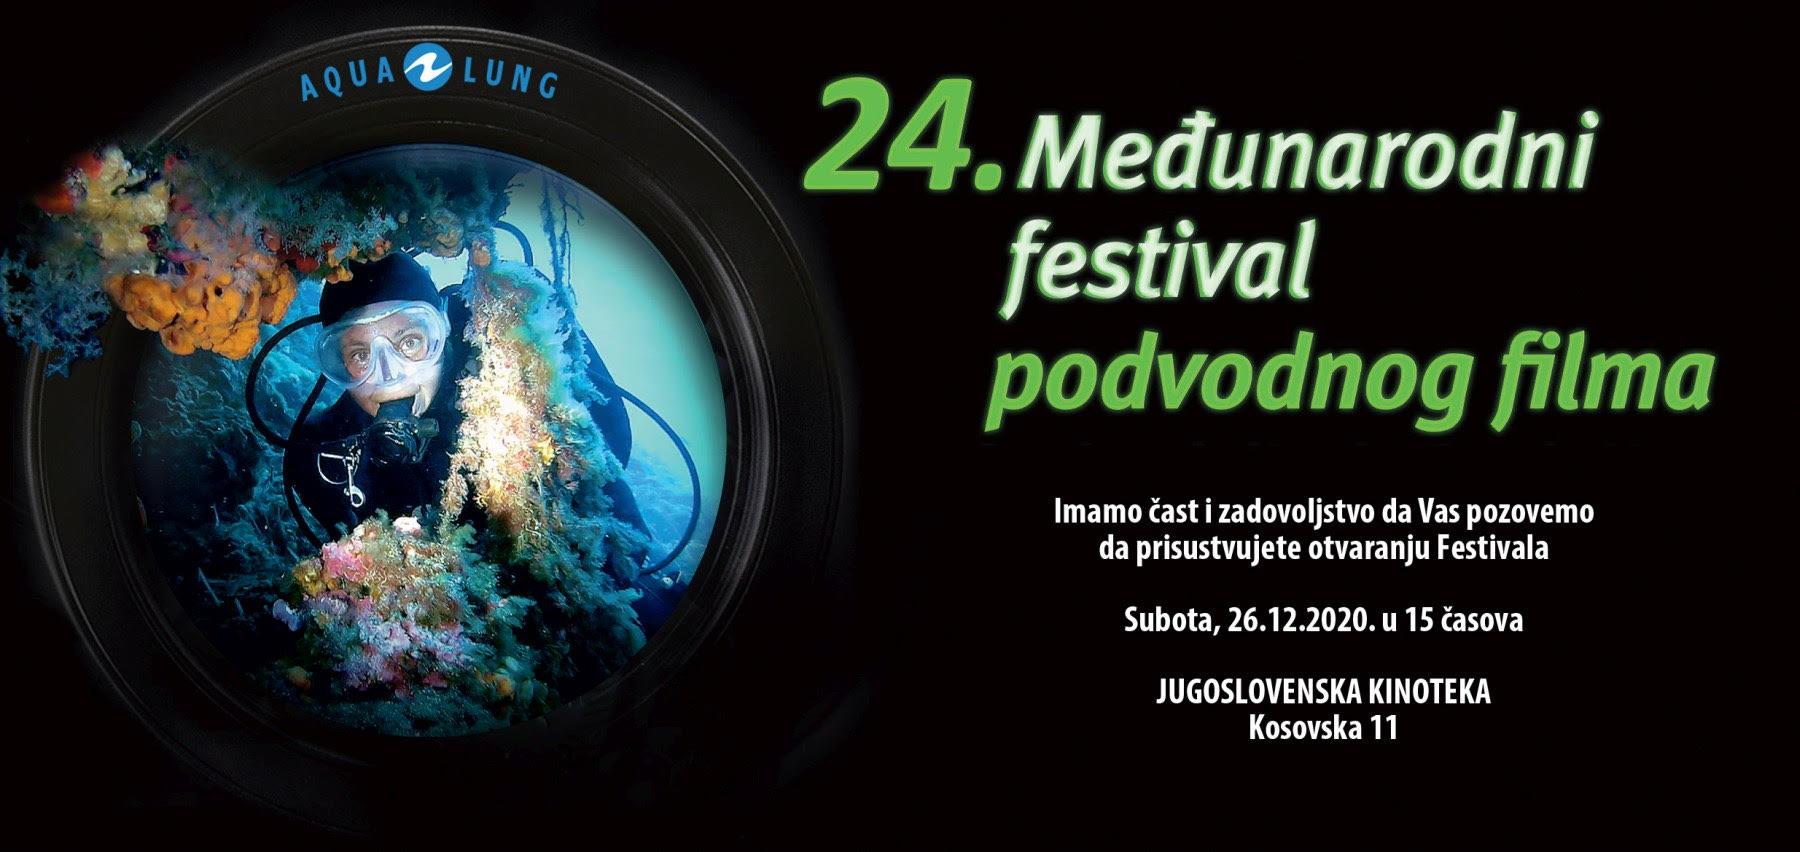 24. Medjunarodni festival podvodnog filma